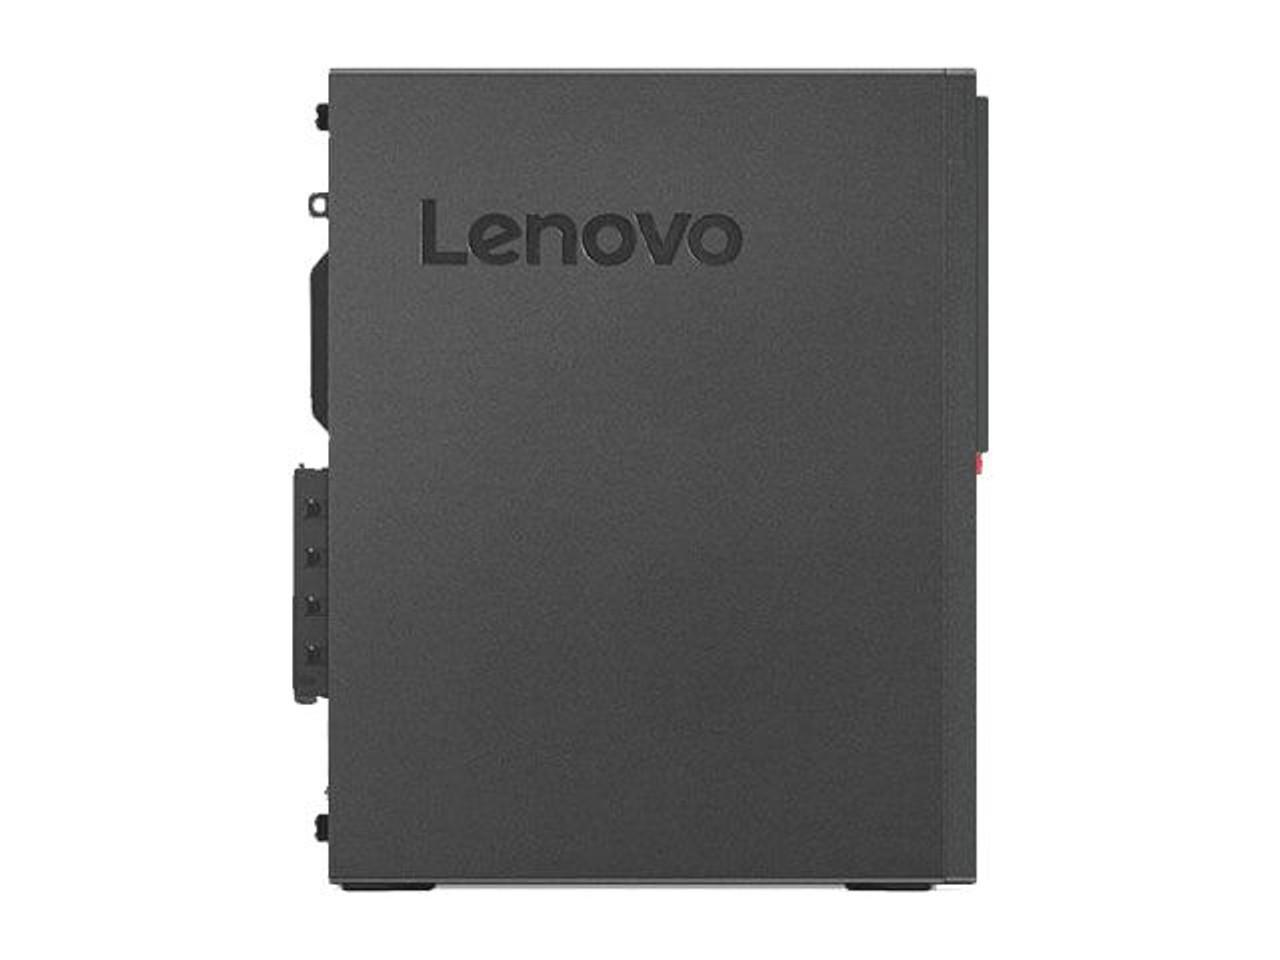 Lenovo ThinkCentre M910s Desktop Small Form Factor